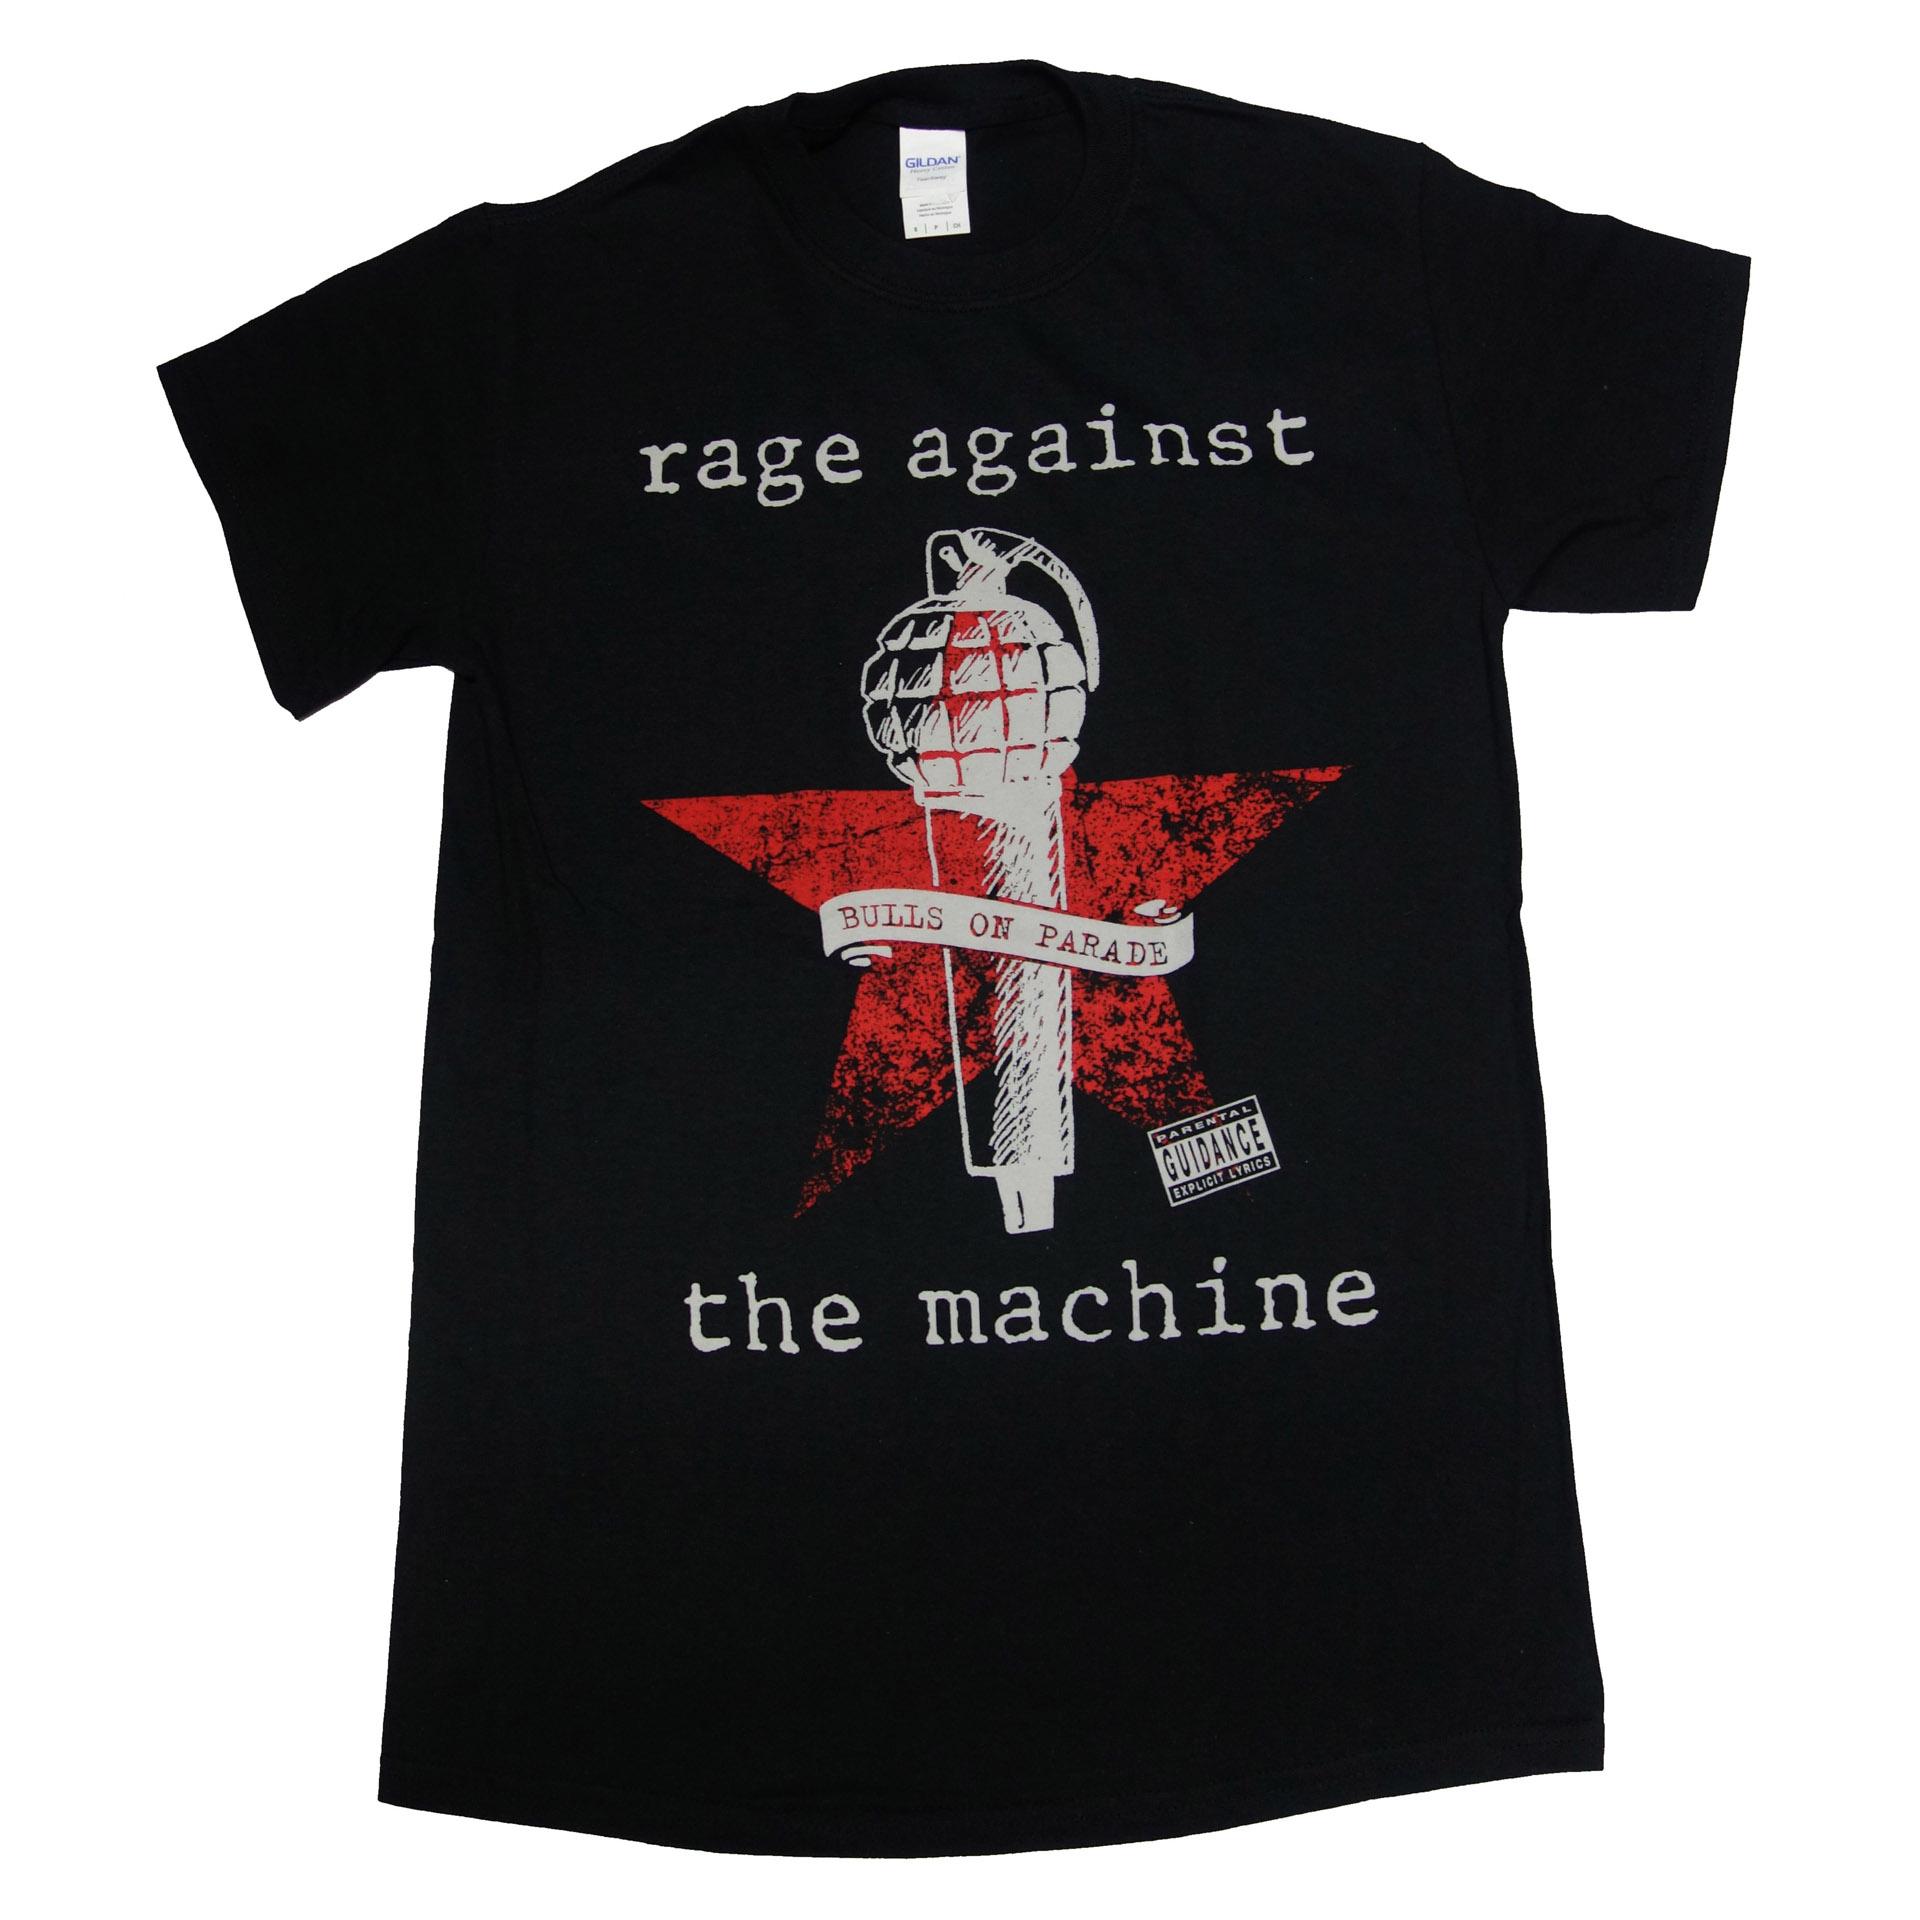 T-Shirt Rage Against The Machine Bulls On Parade Mic